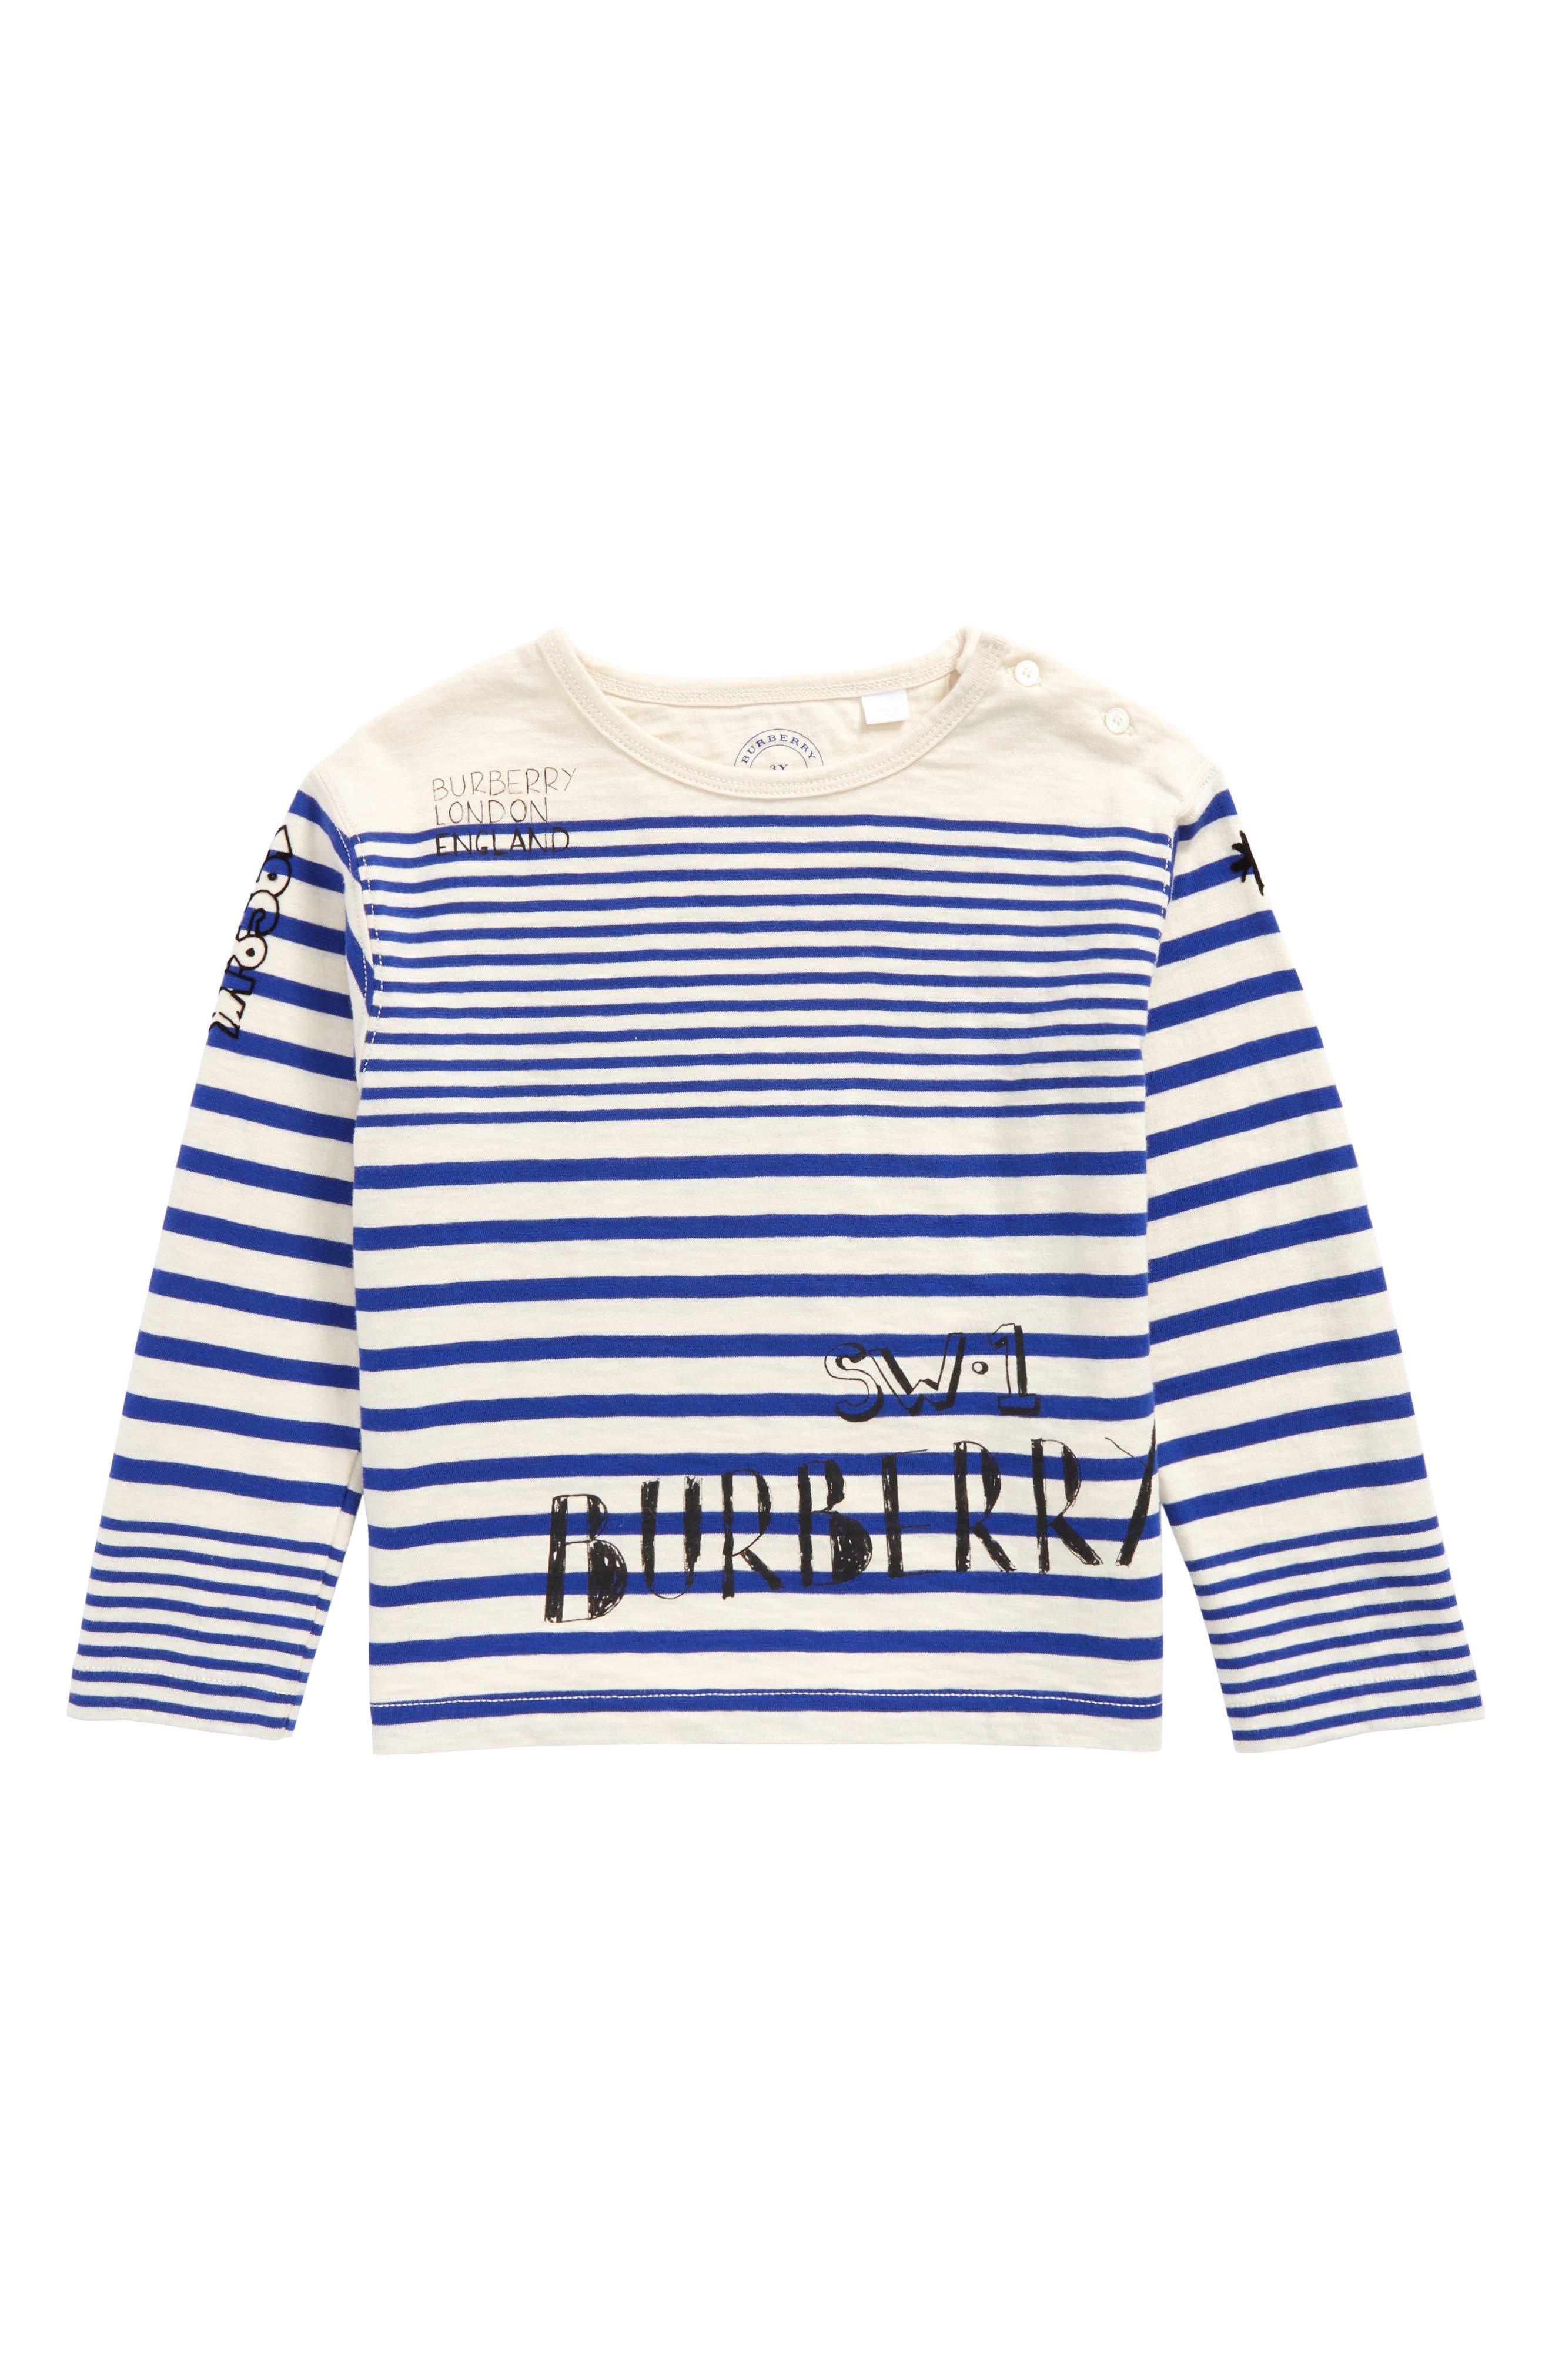 Main Image - Burberry Stripe T-Shirt (Toddler Boys)